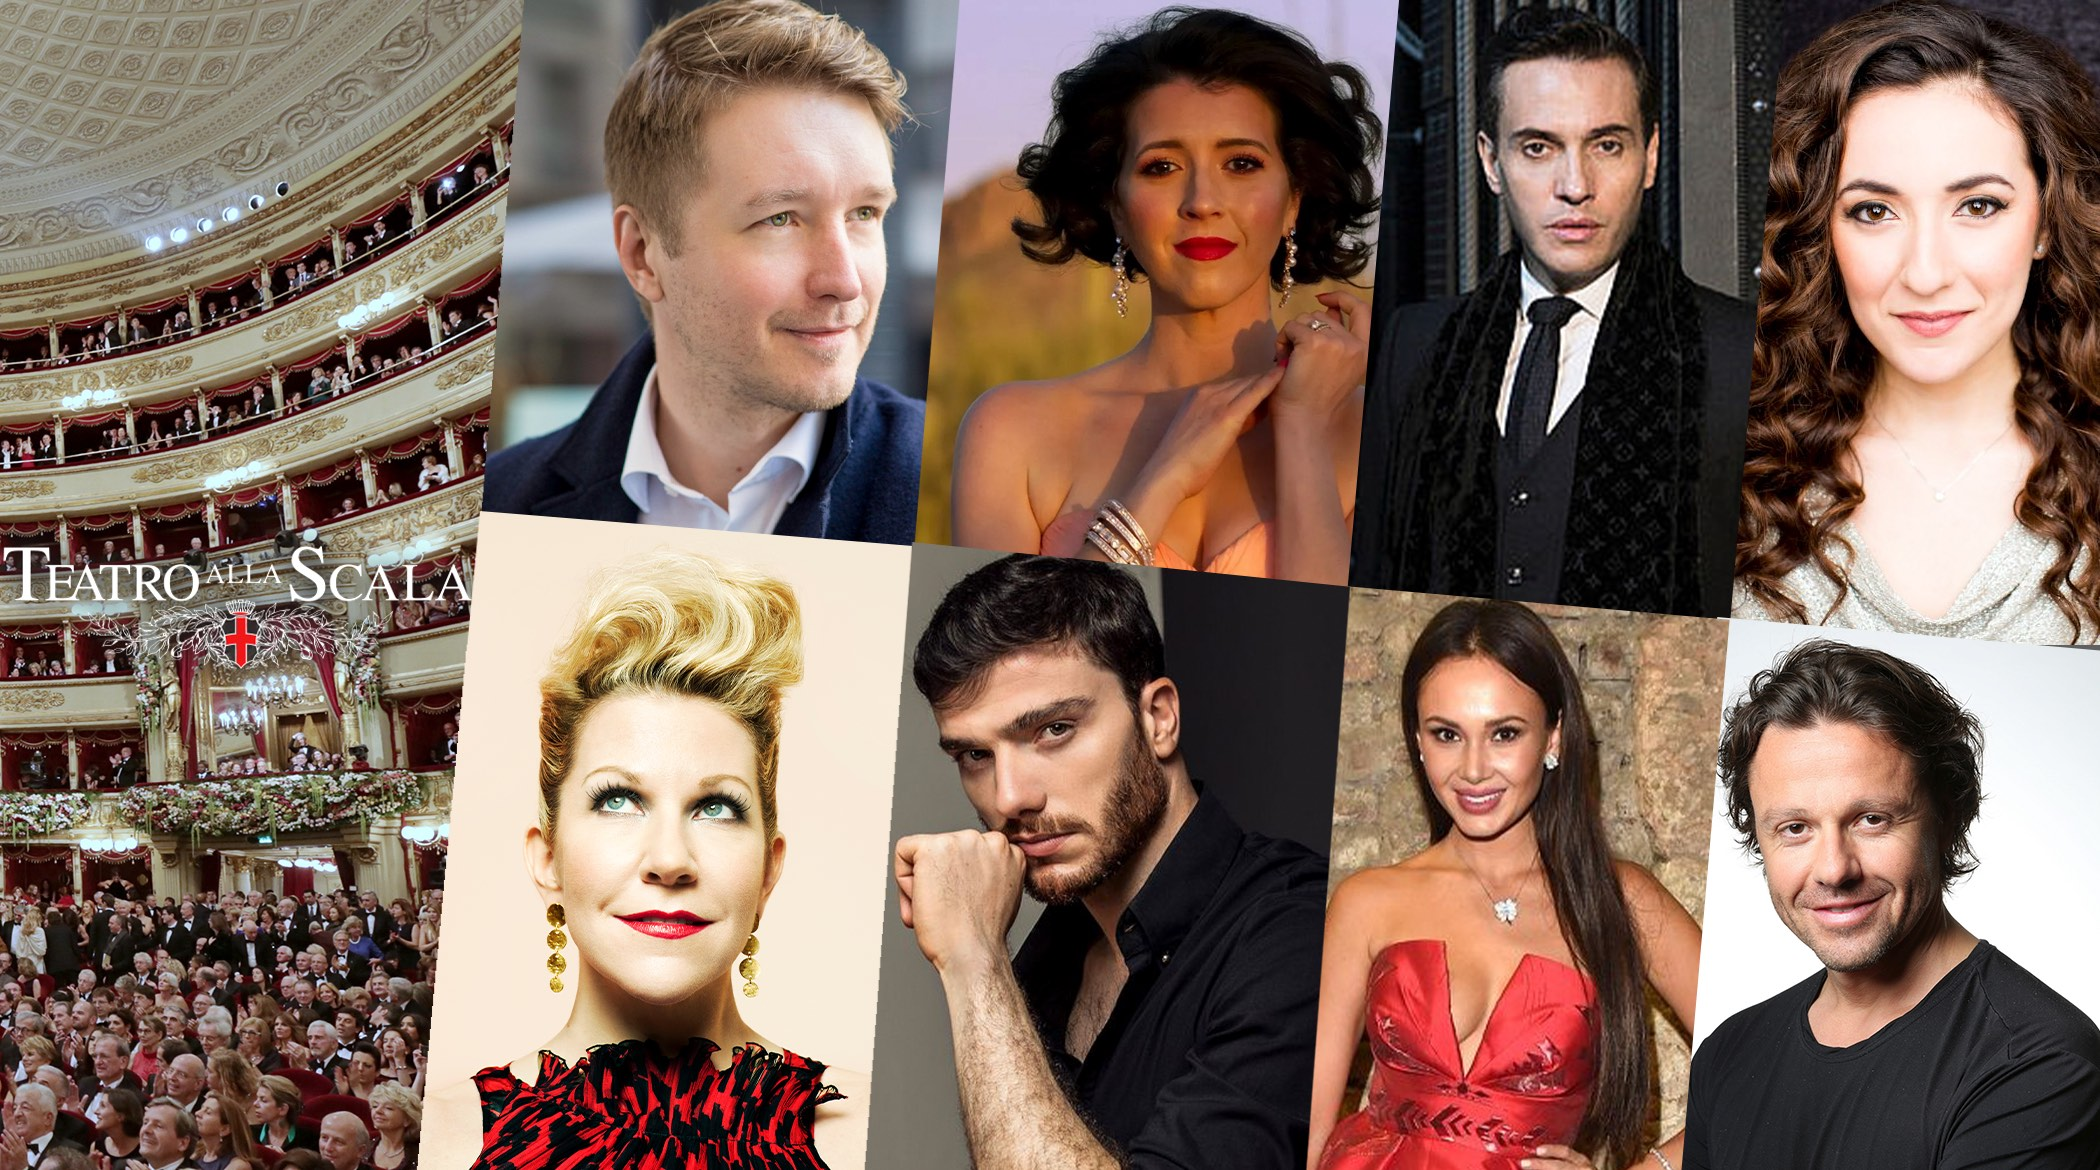 Autunno 21 del Teatro alla Scala; Milano; Opera; Teatro; Joyce DiDonato; Maxim Mironov; Lisette Oropesa; Rosa Feola; Aida Garifullina; Mattia Olivieri; Erwin Schrott; Markus Werba